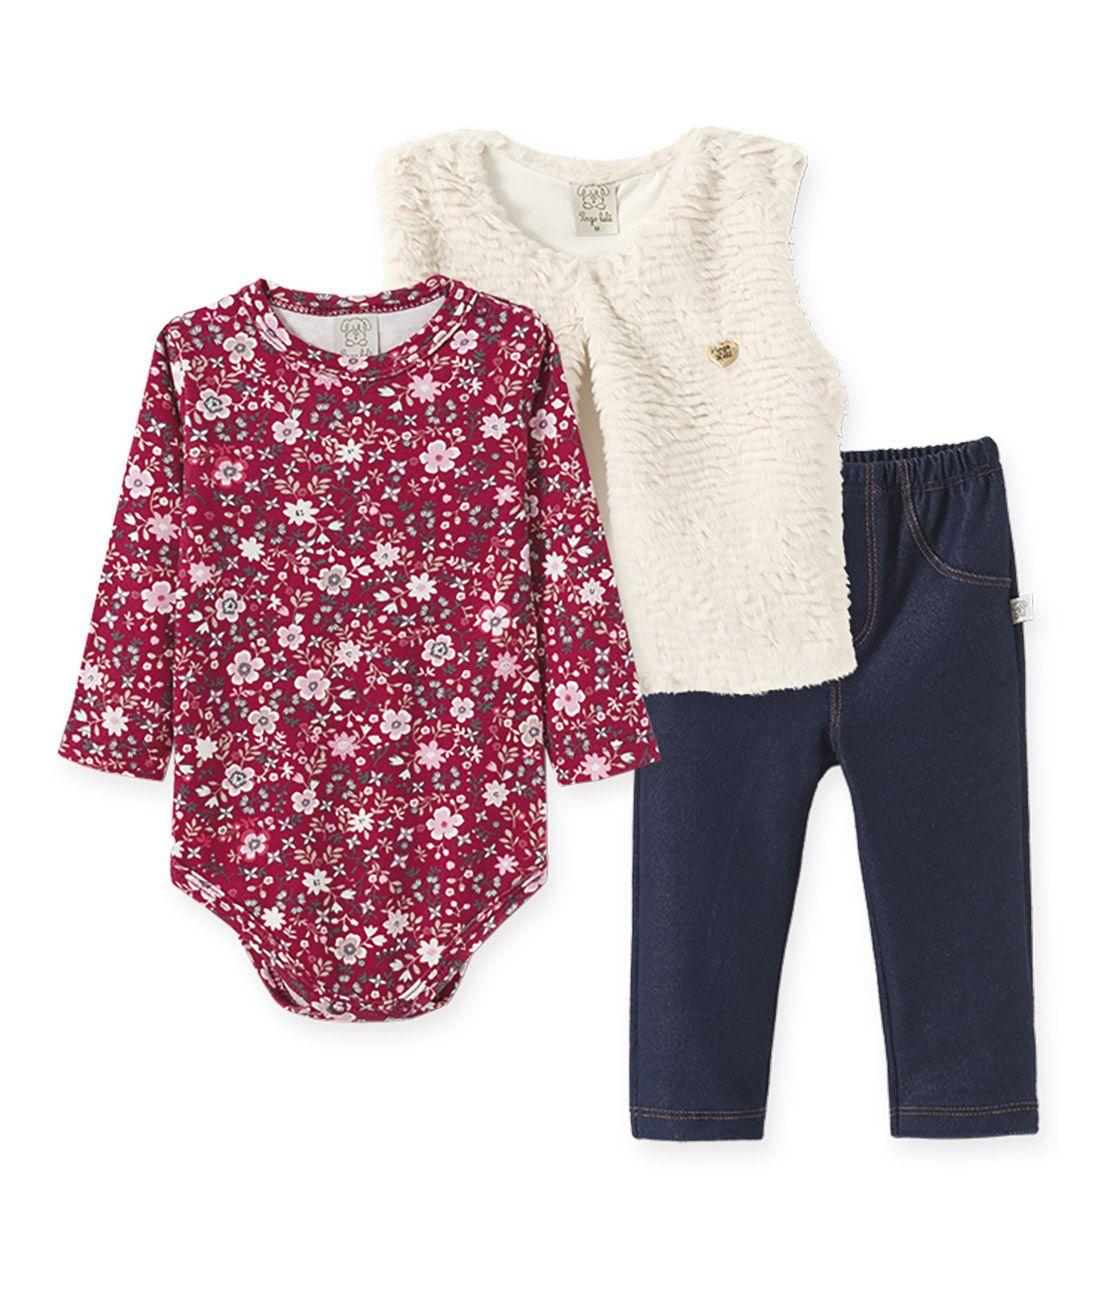 Conjunto Body manga longa, Calça Cotton Jeans e Colete Pelo Pingo Lelê  Floral Folk